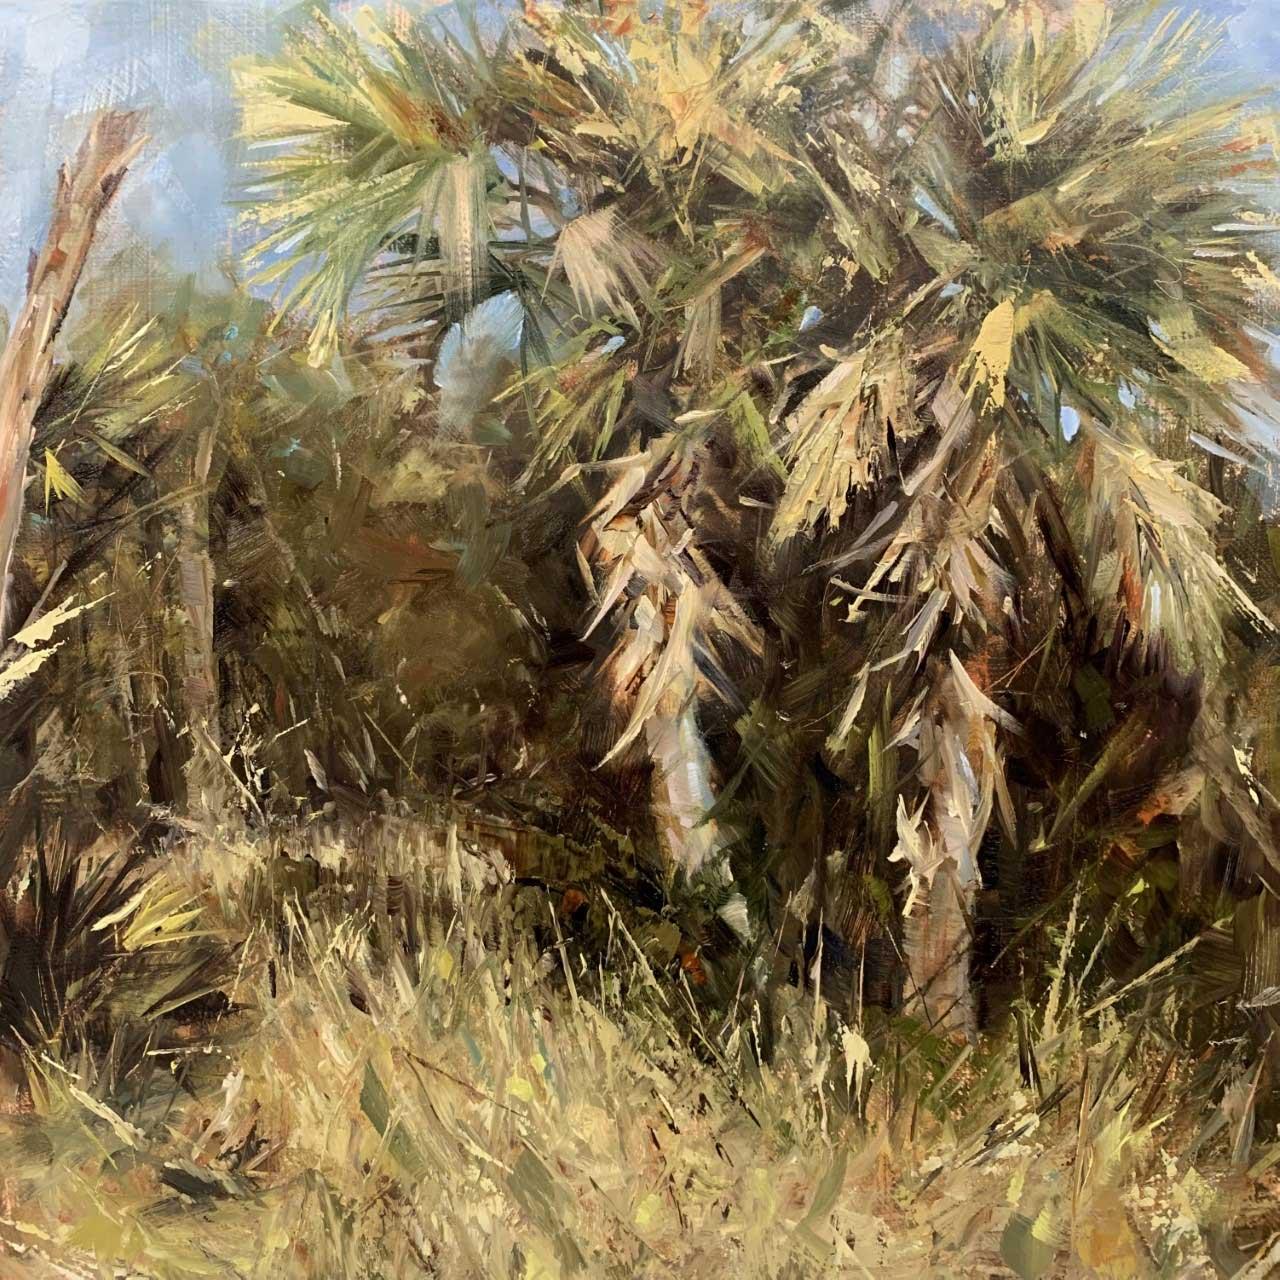 Rana Jordahl, Palm Sunday 10x10 Oil on Board, $450